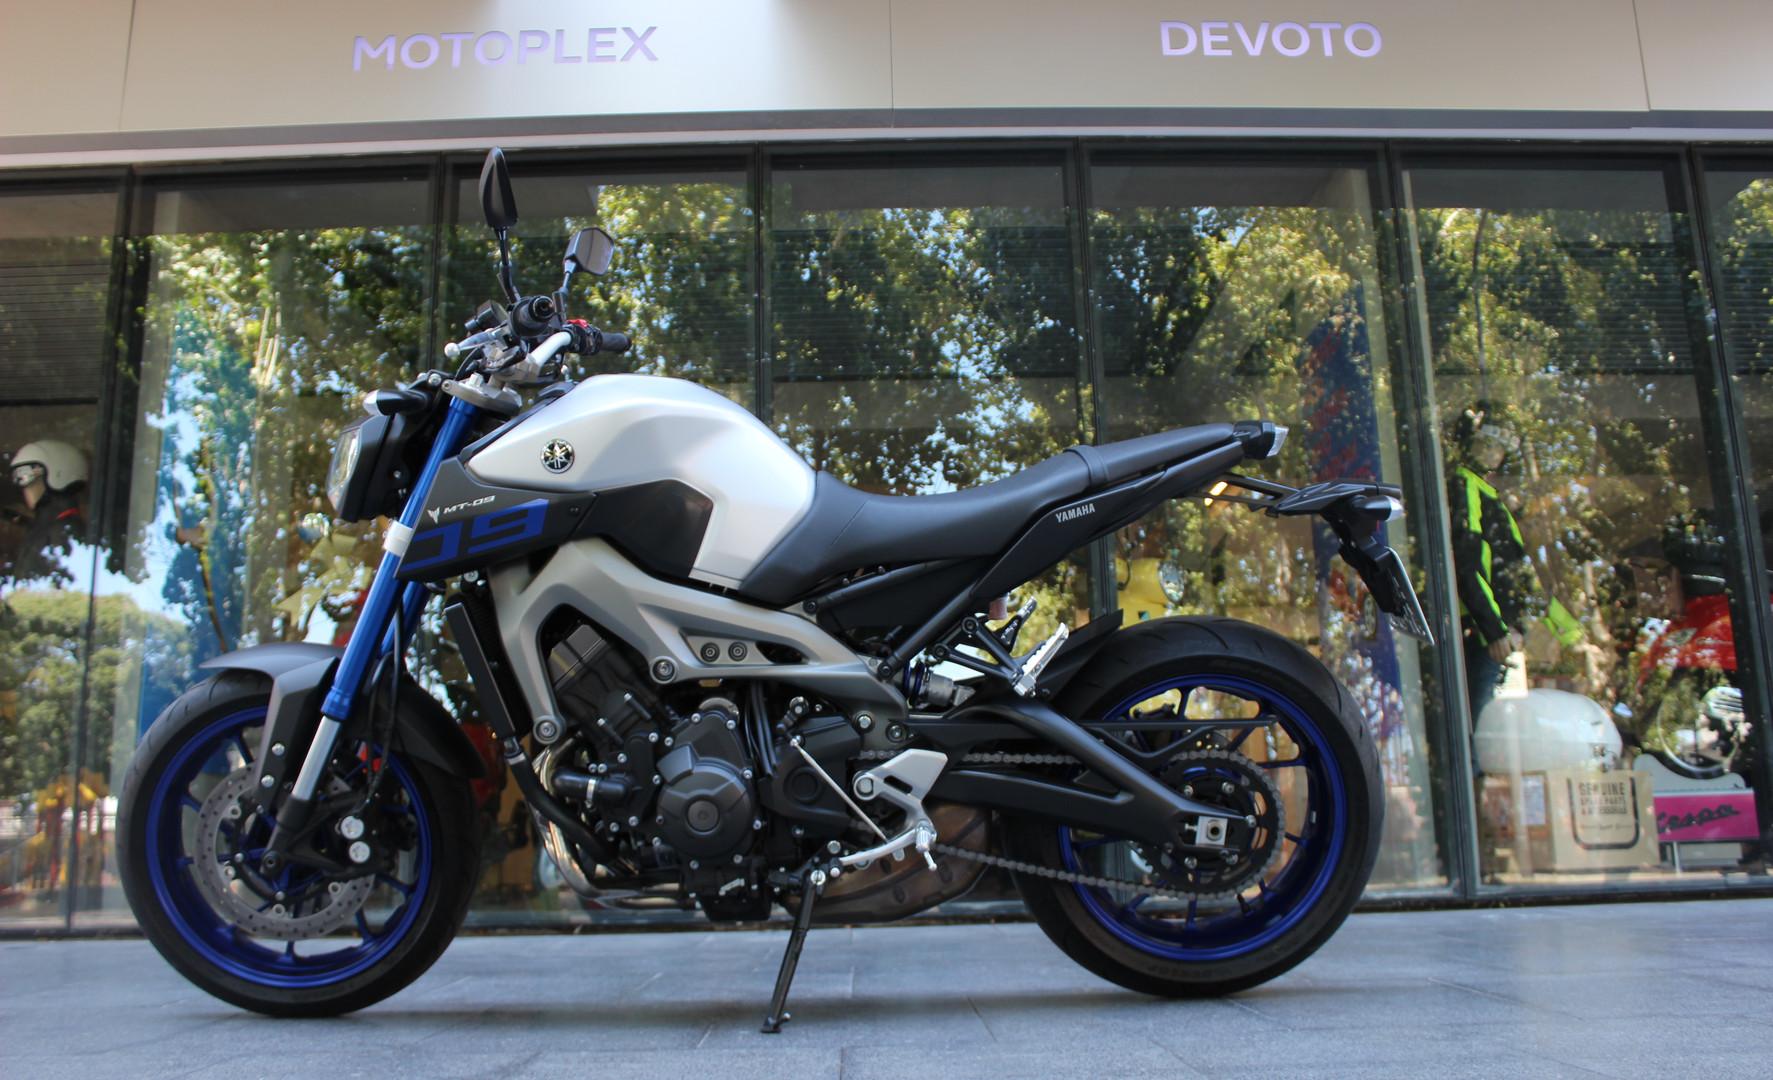 Usados seleccionados Motoplex Devoto Yamaha MT 09